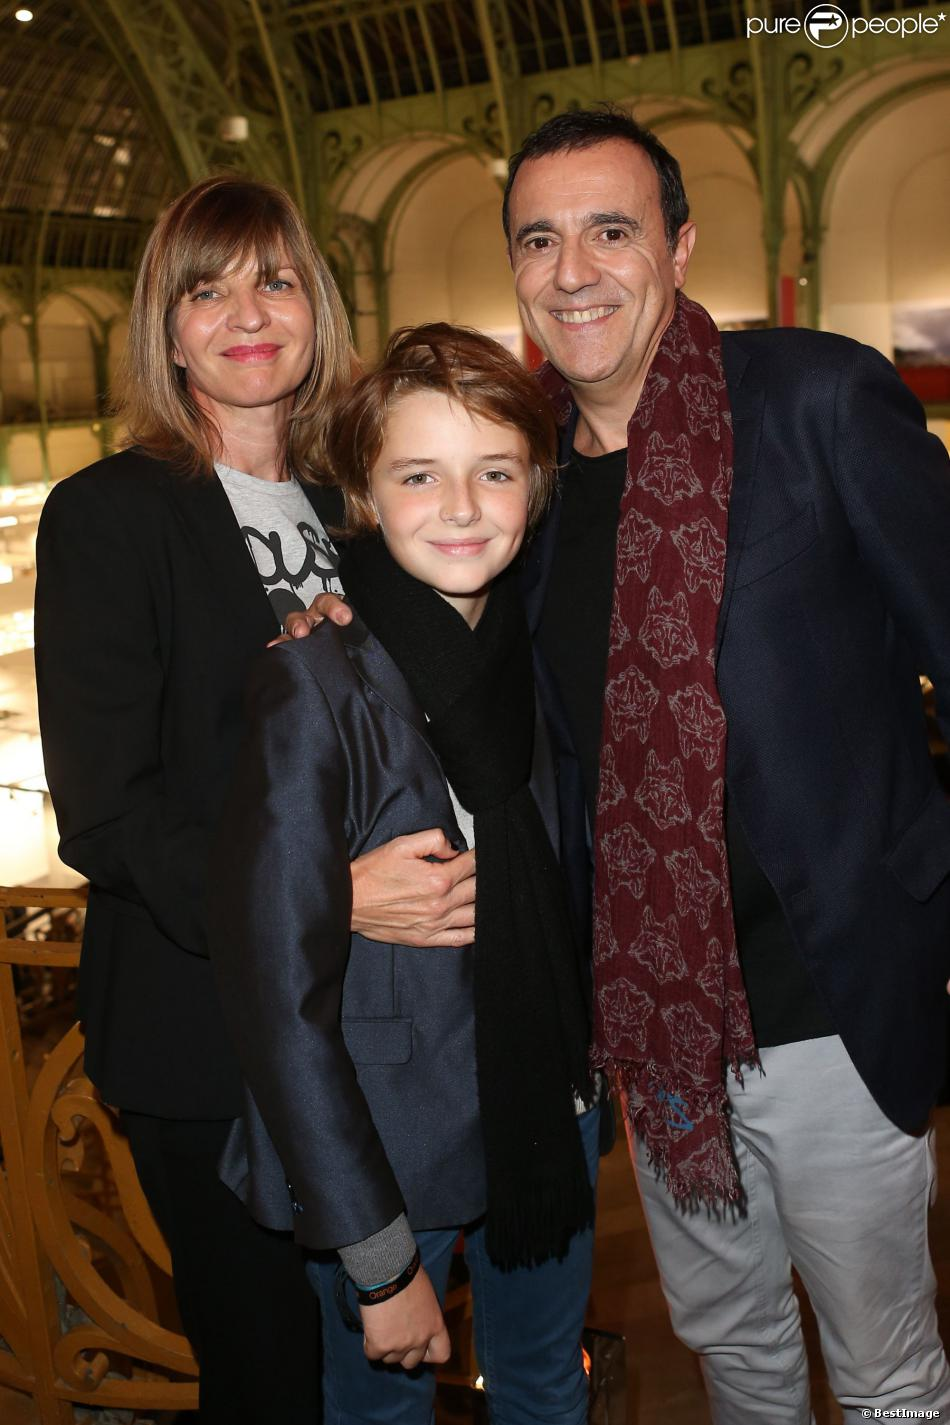 Thierry beccaro sa femme emmanuelle et son fils lucas - Thierry beccaro emmanuelle beccaro lannes ...